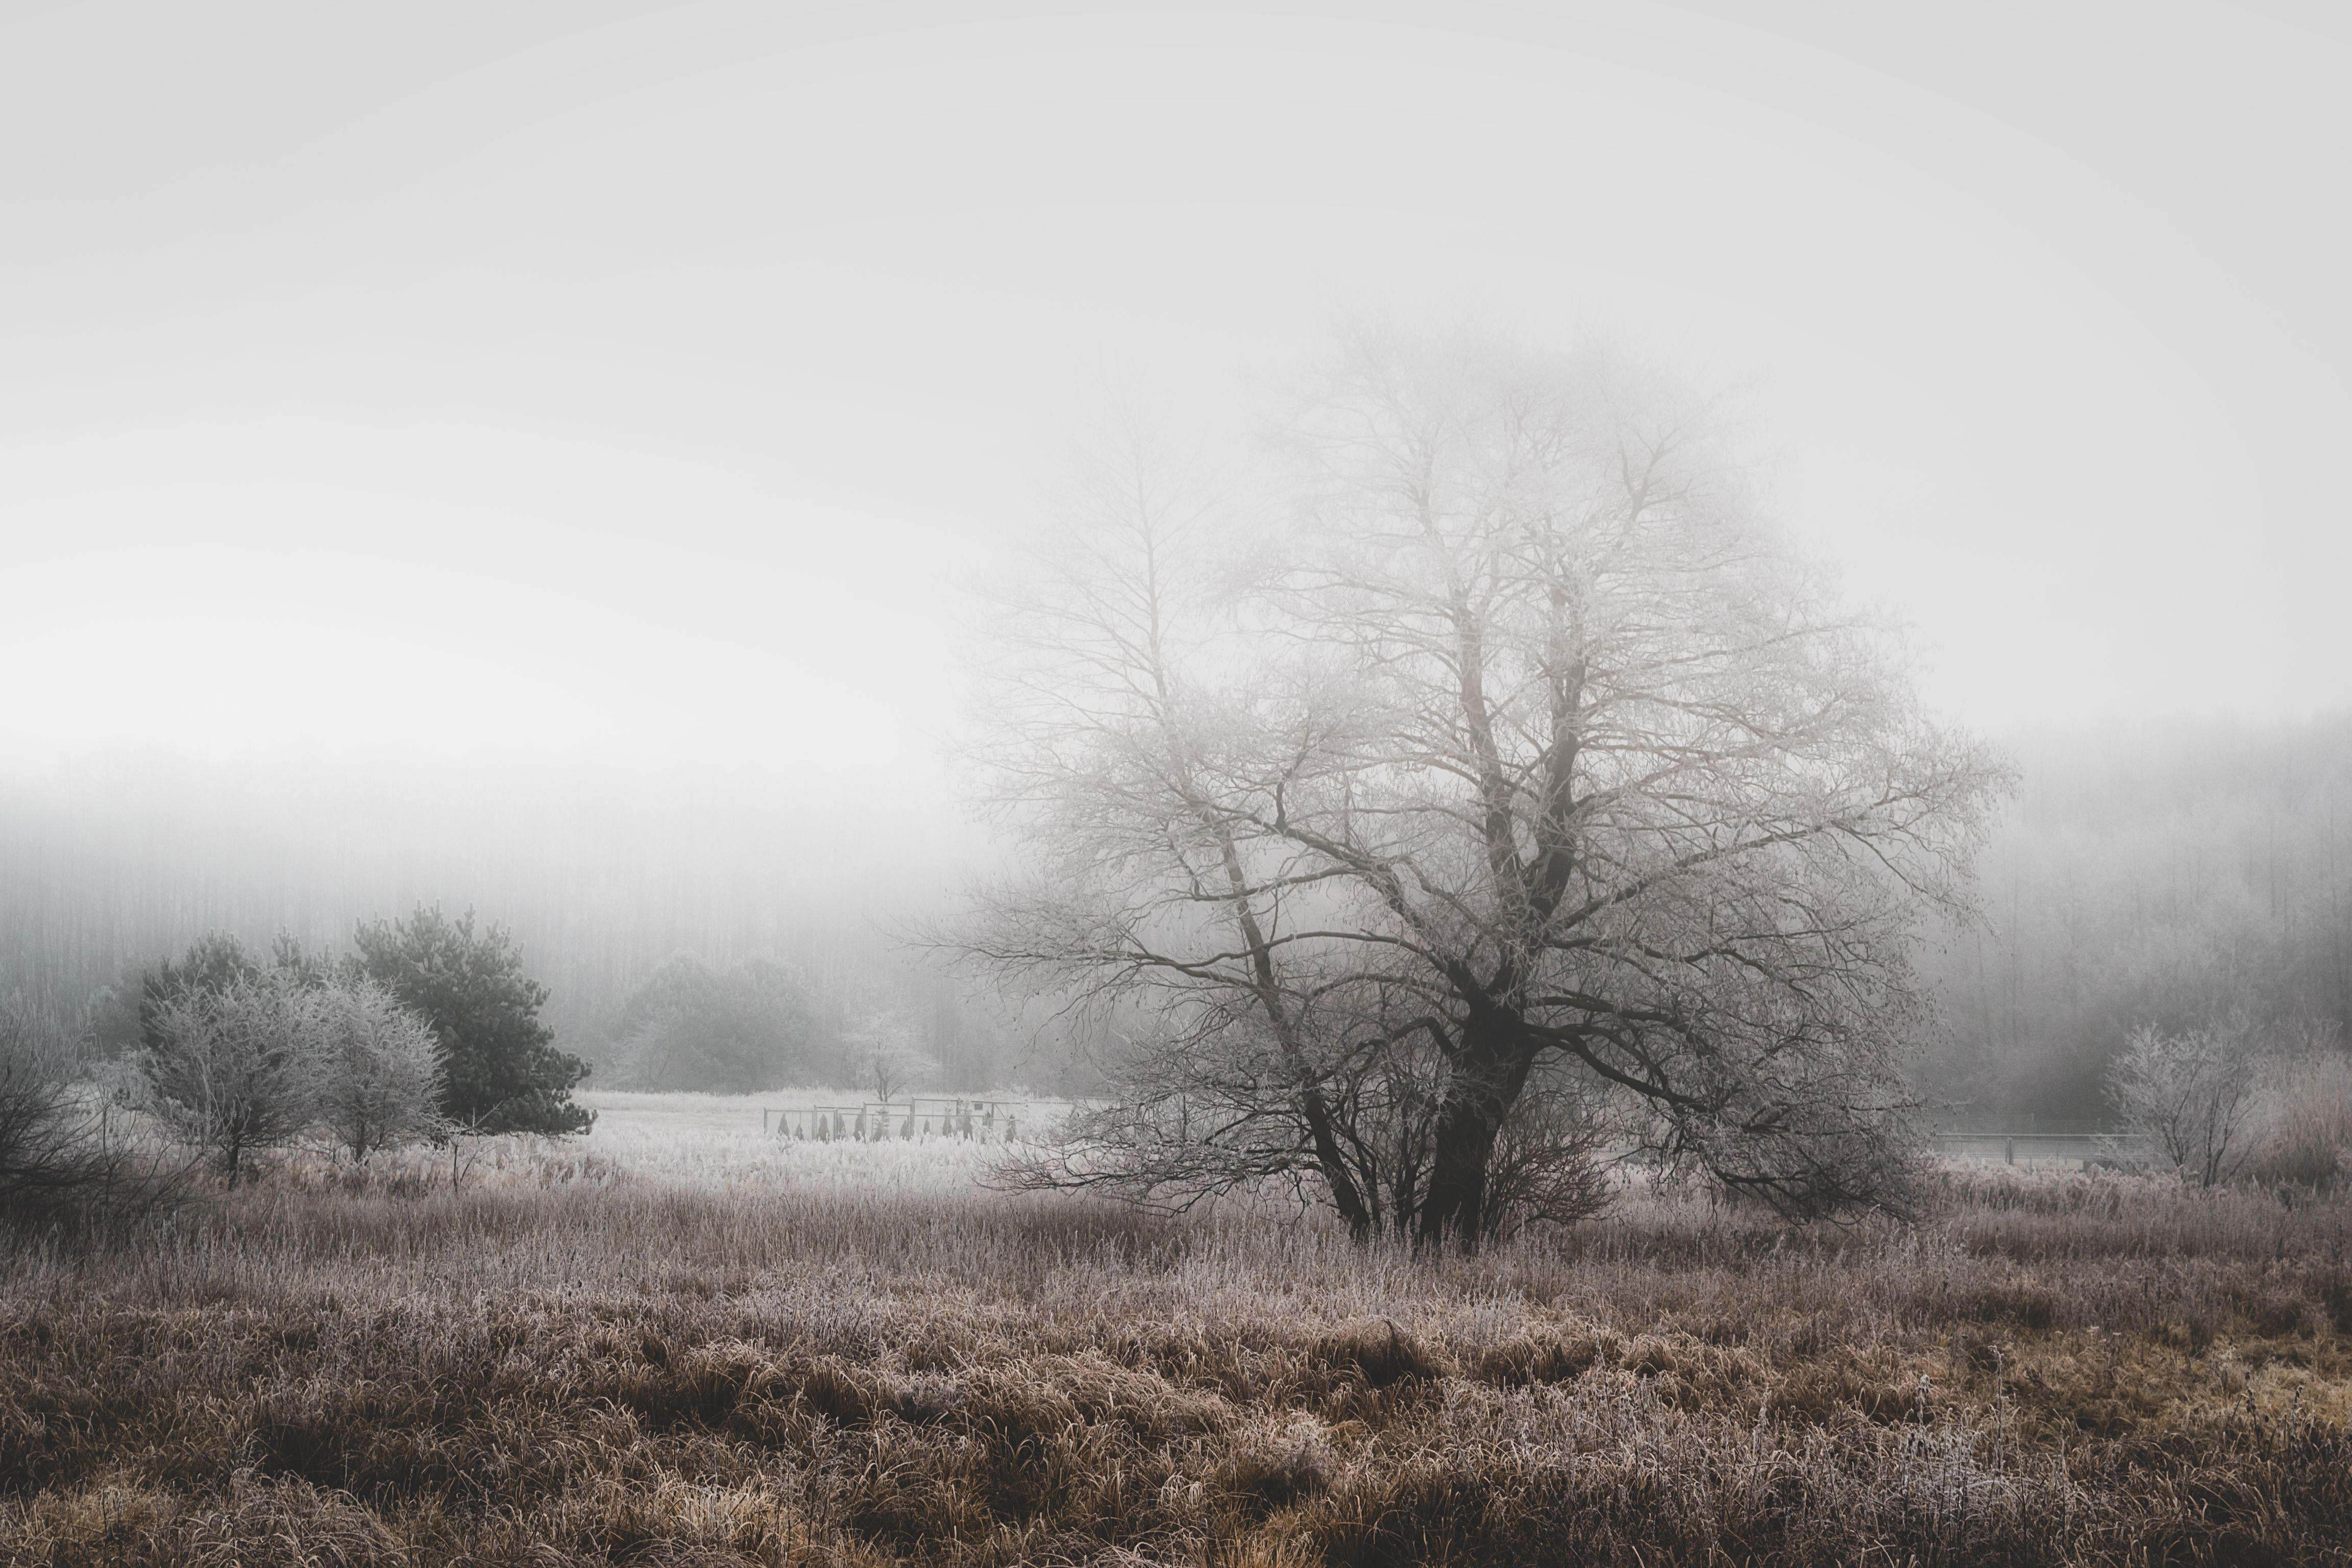 tree,nature,winter,sky,landscape,nikon,morning,fog,mist, ground frost, Tollas Krzysztof